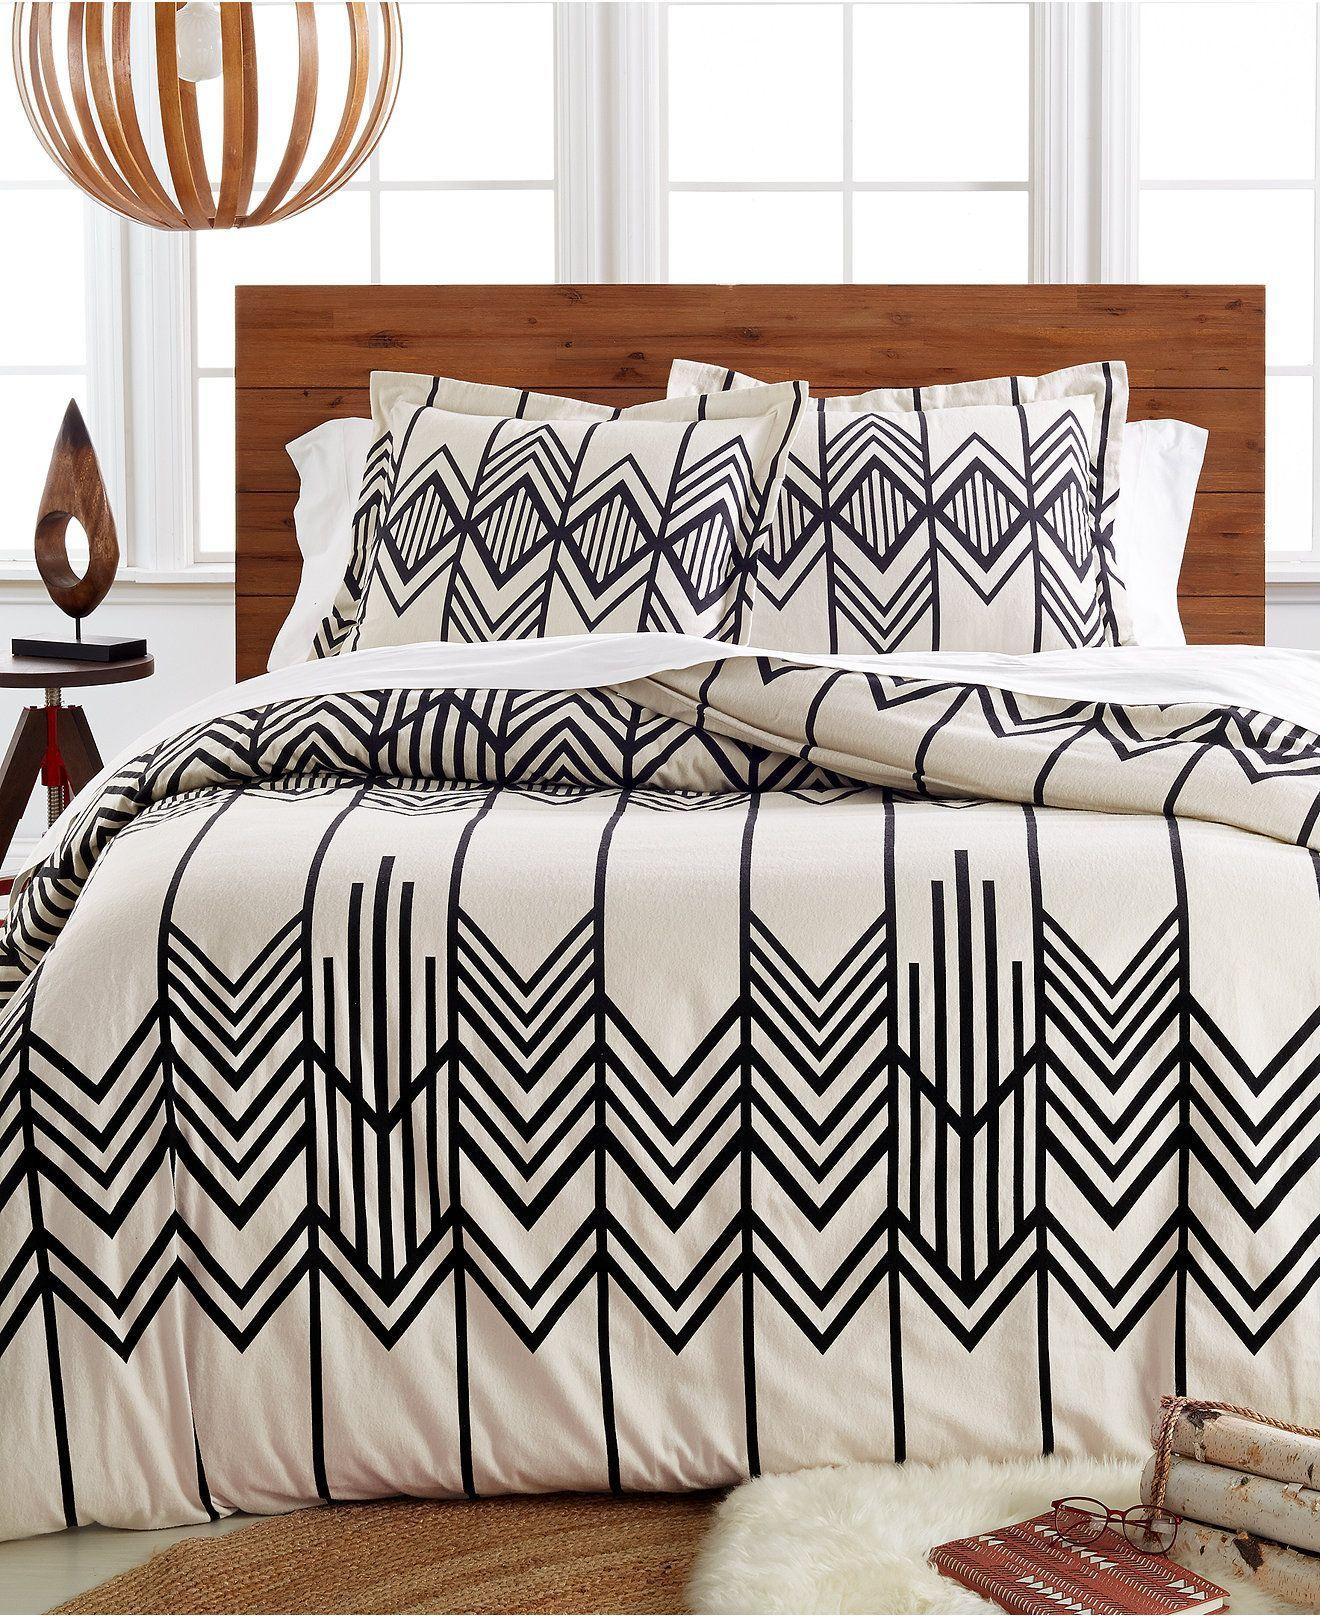 Pendleton Flannel Skywalker Queen duvet Cover Bedding